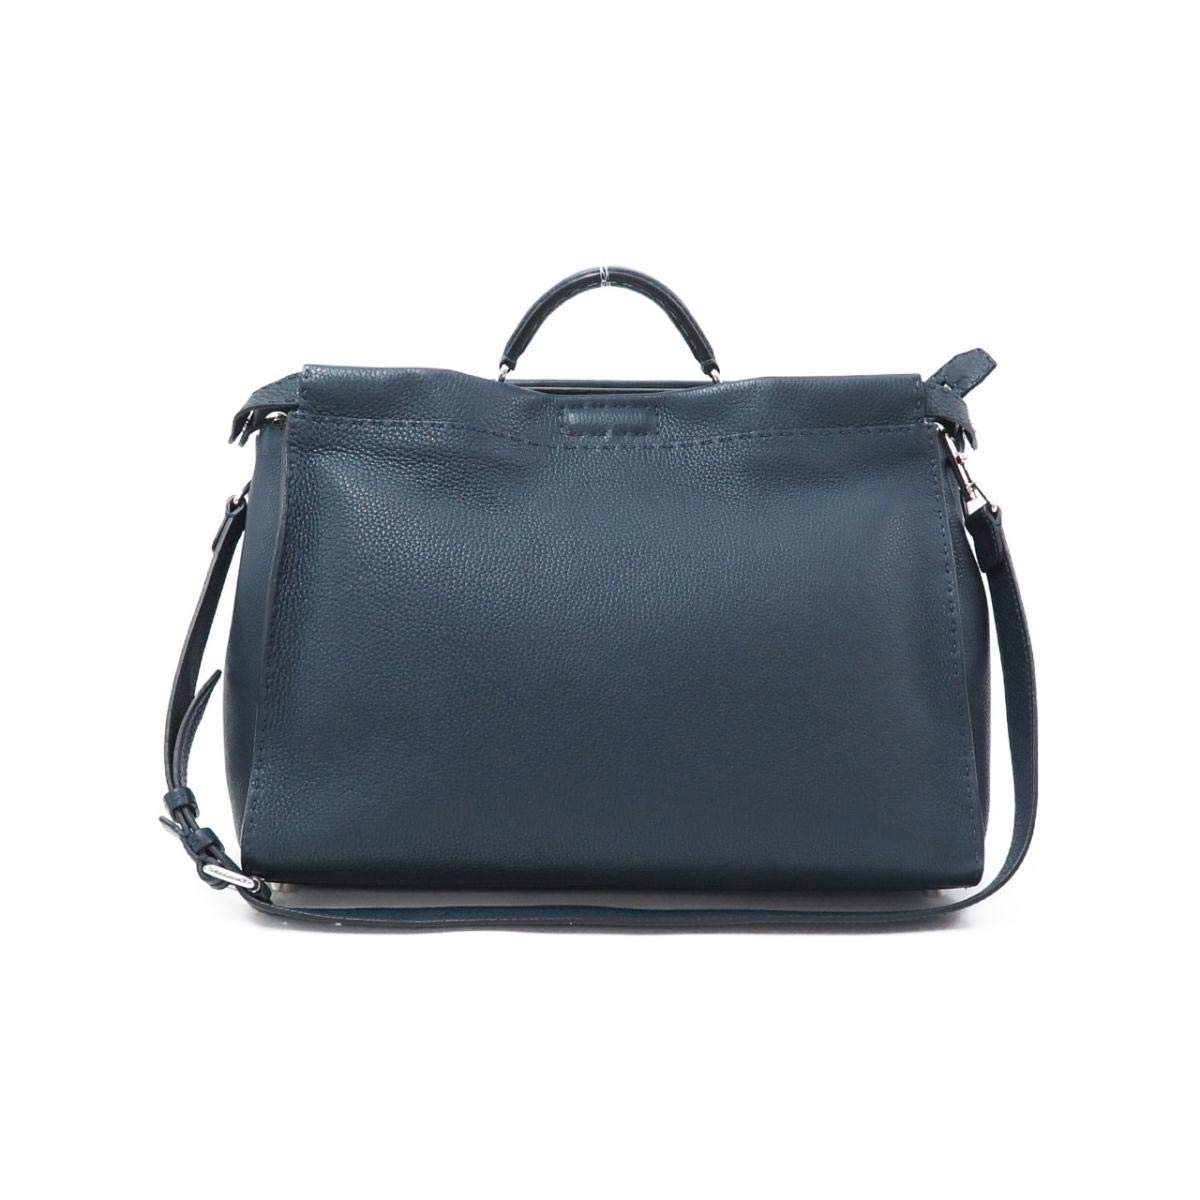 Black//Brown Color : Black 28x30x6cm Briefcase TLMYDD Mens Shoulder Messenger Bag Tote Leather Ribbon Splicing Solid Color Business Briefcase